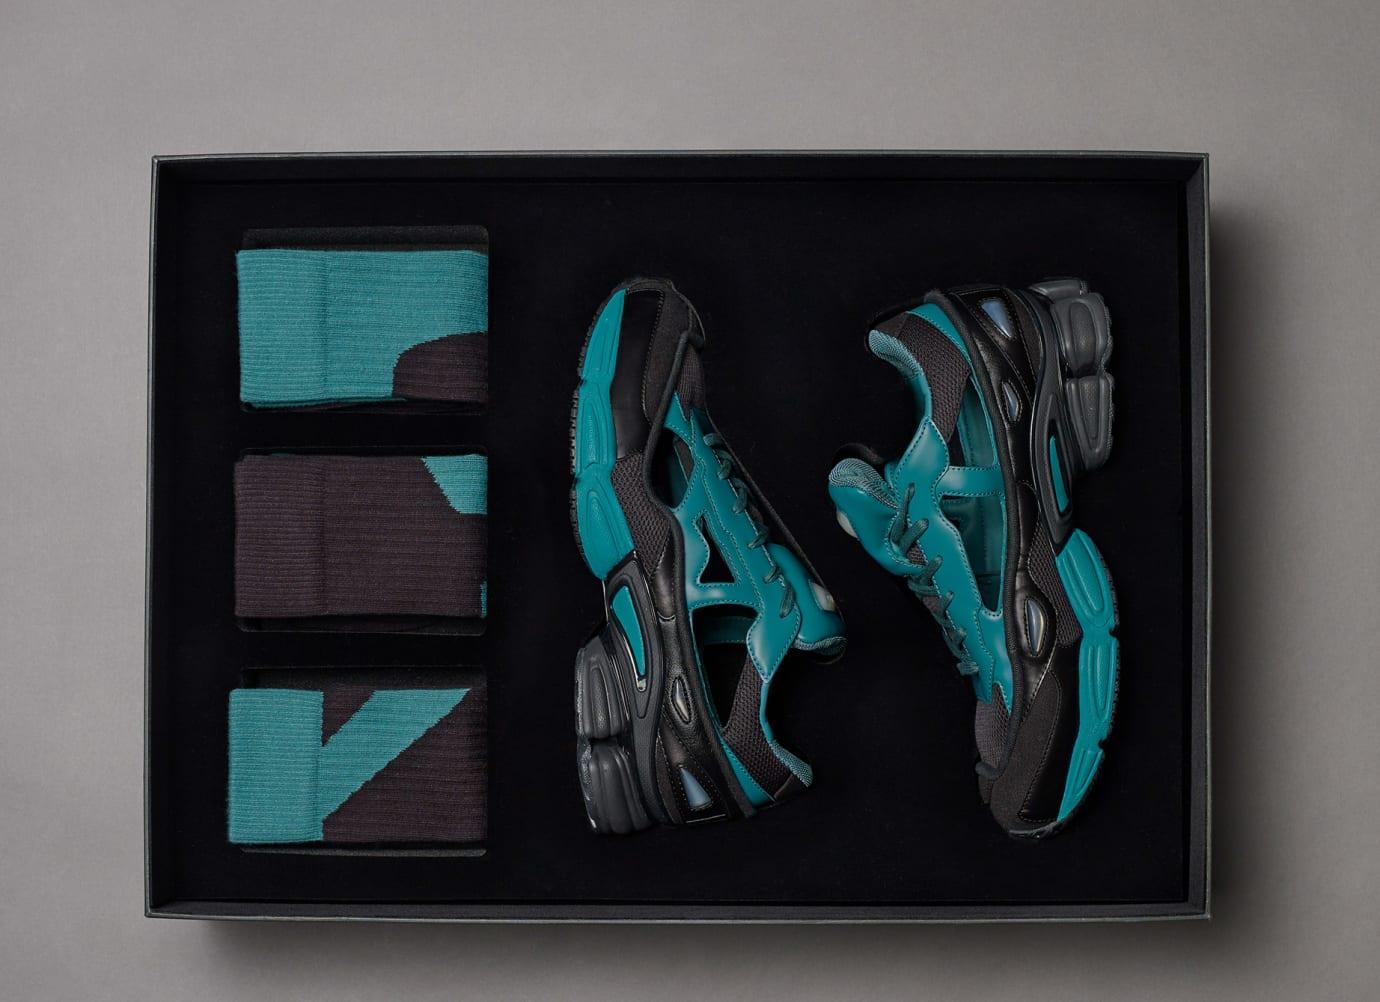 Raf Simons x Adidas Replicant Ozweego B27939